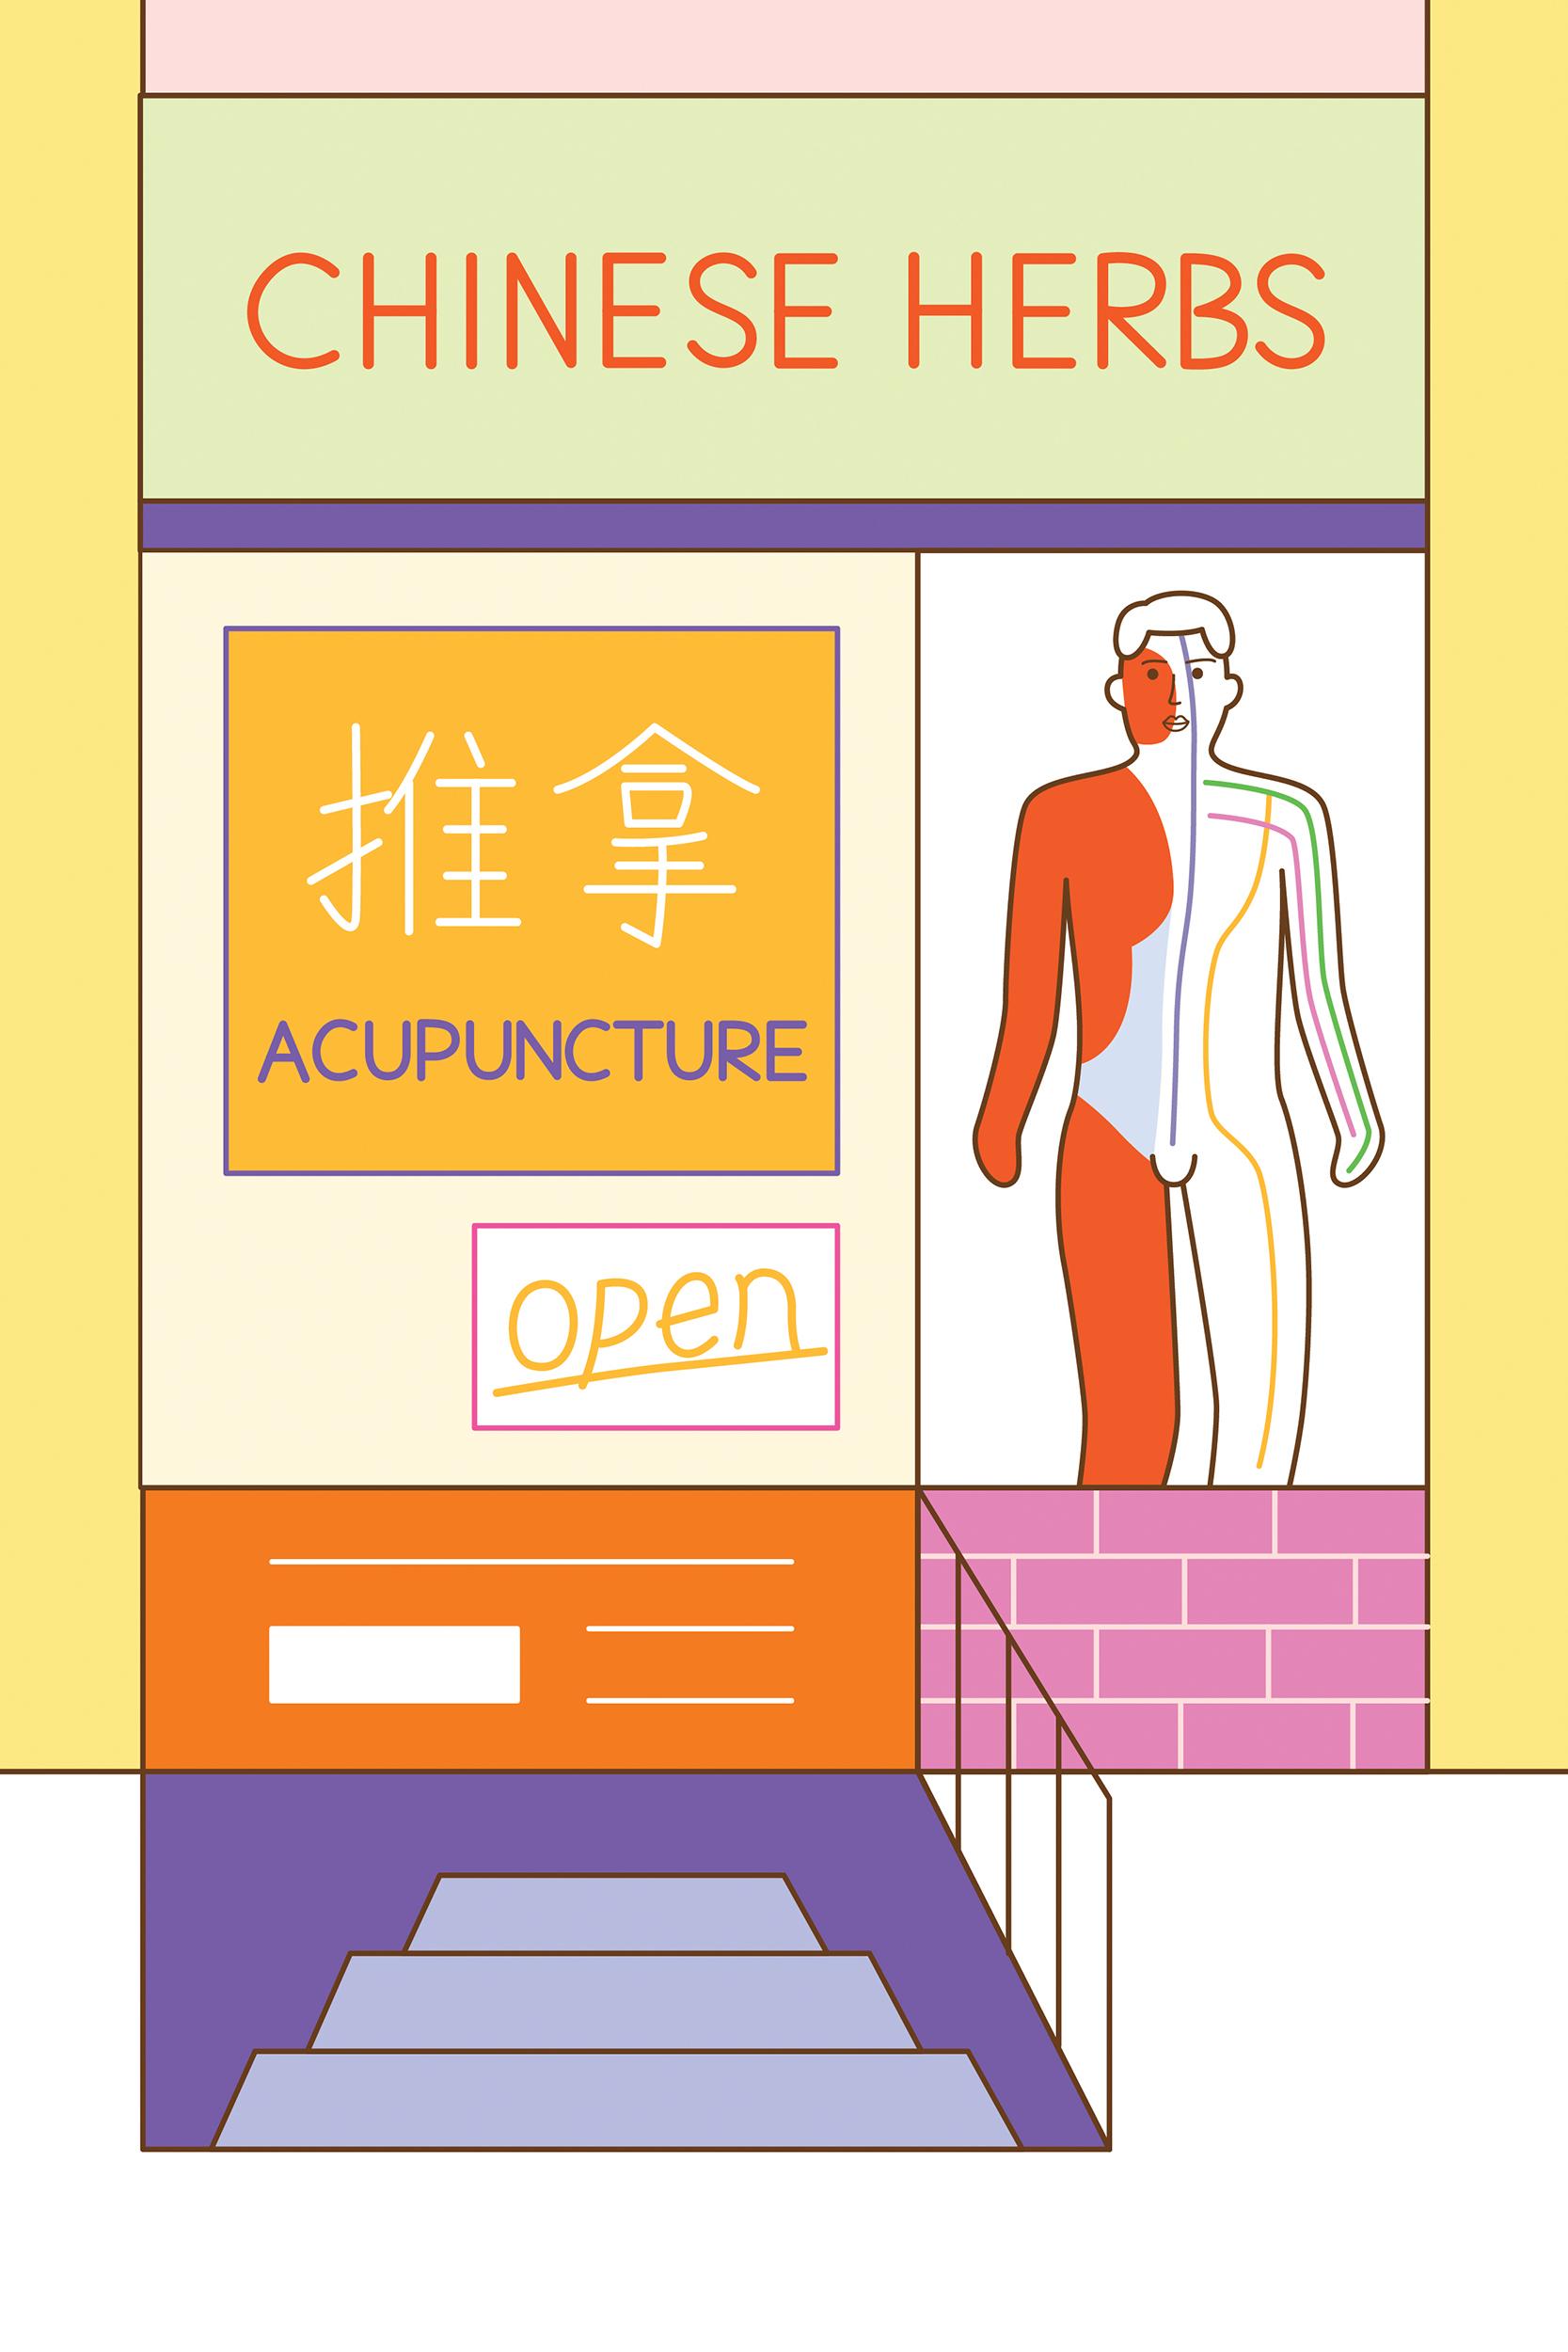 Gateways to Chinatown 0630-33.jpg